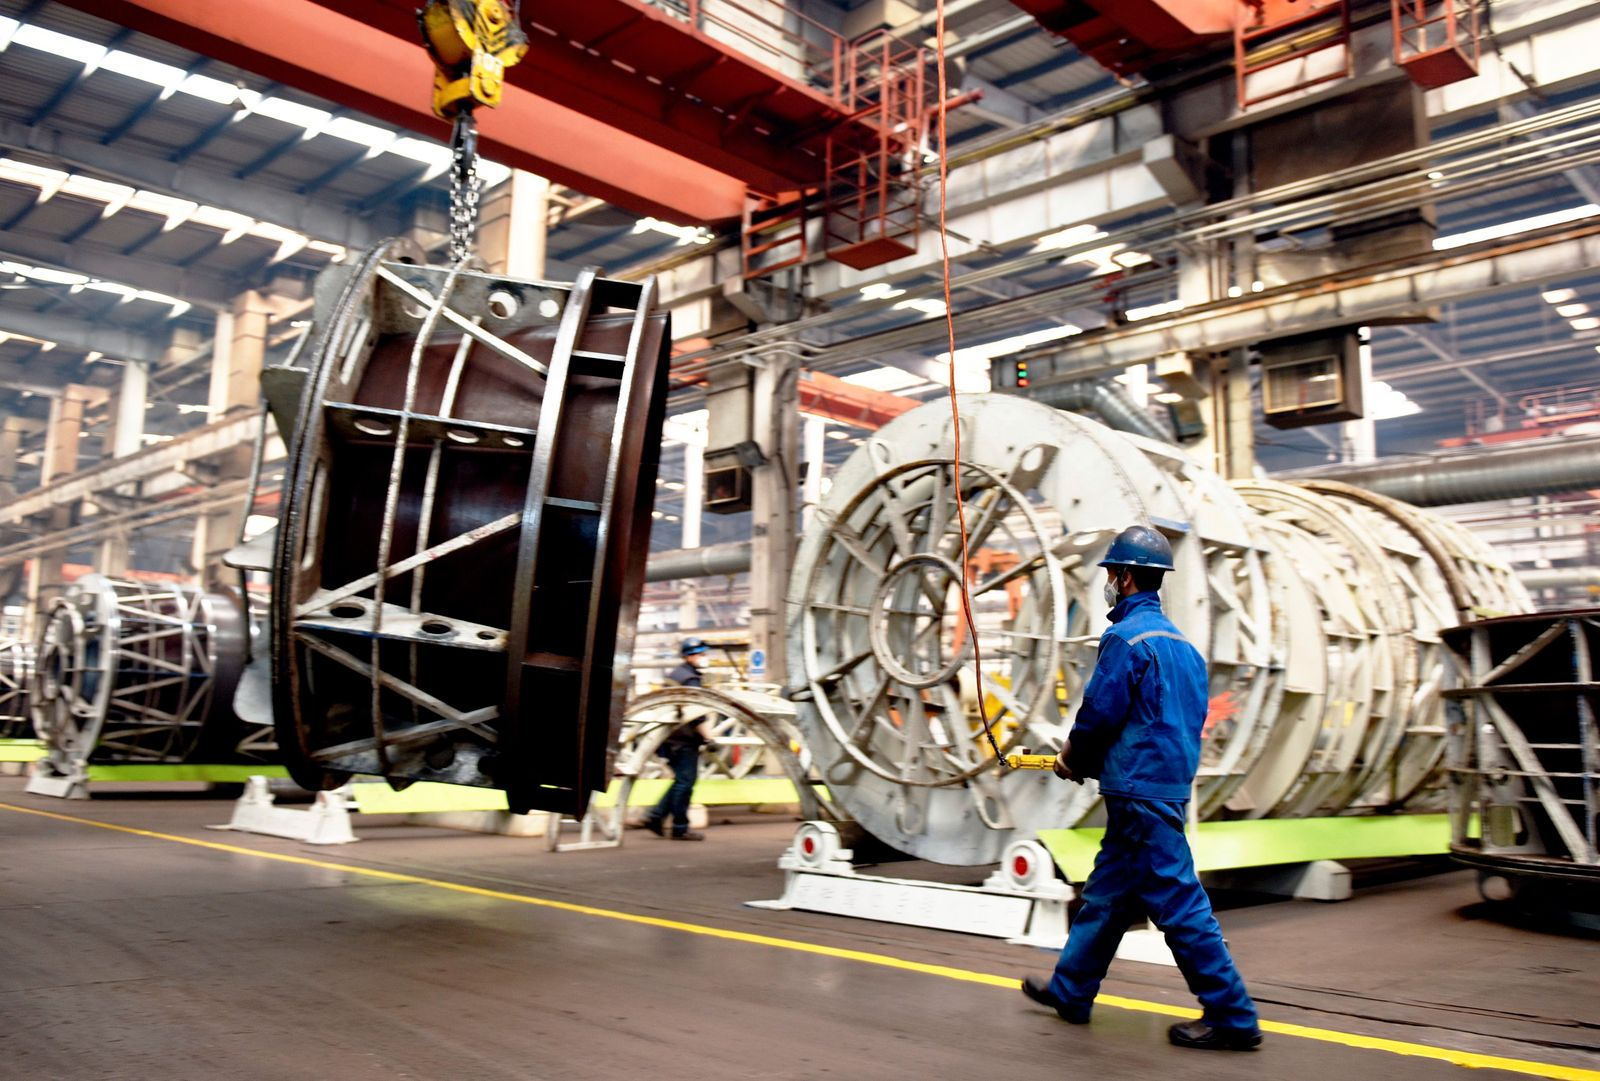 CHINA CHINESE CONSTRUCTION MACHINE COMPANY WORKER ASSEMBLE